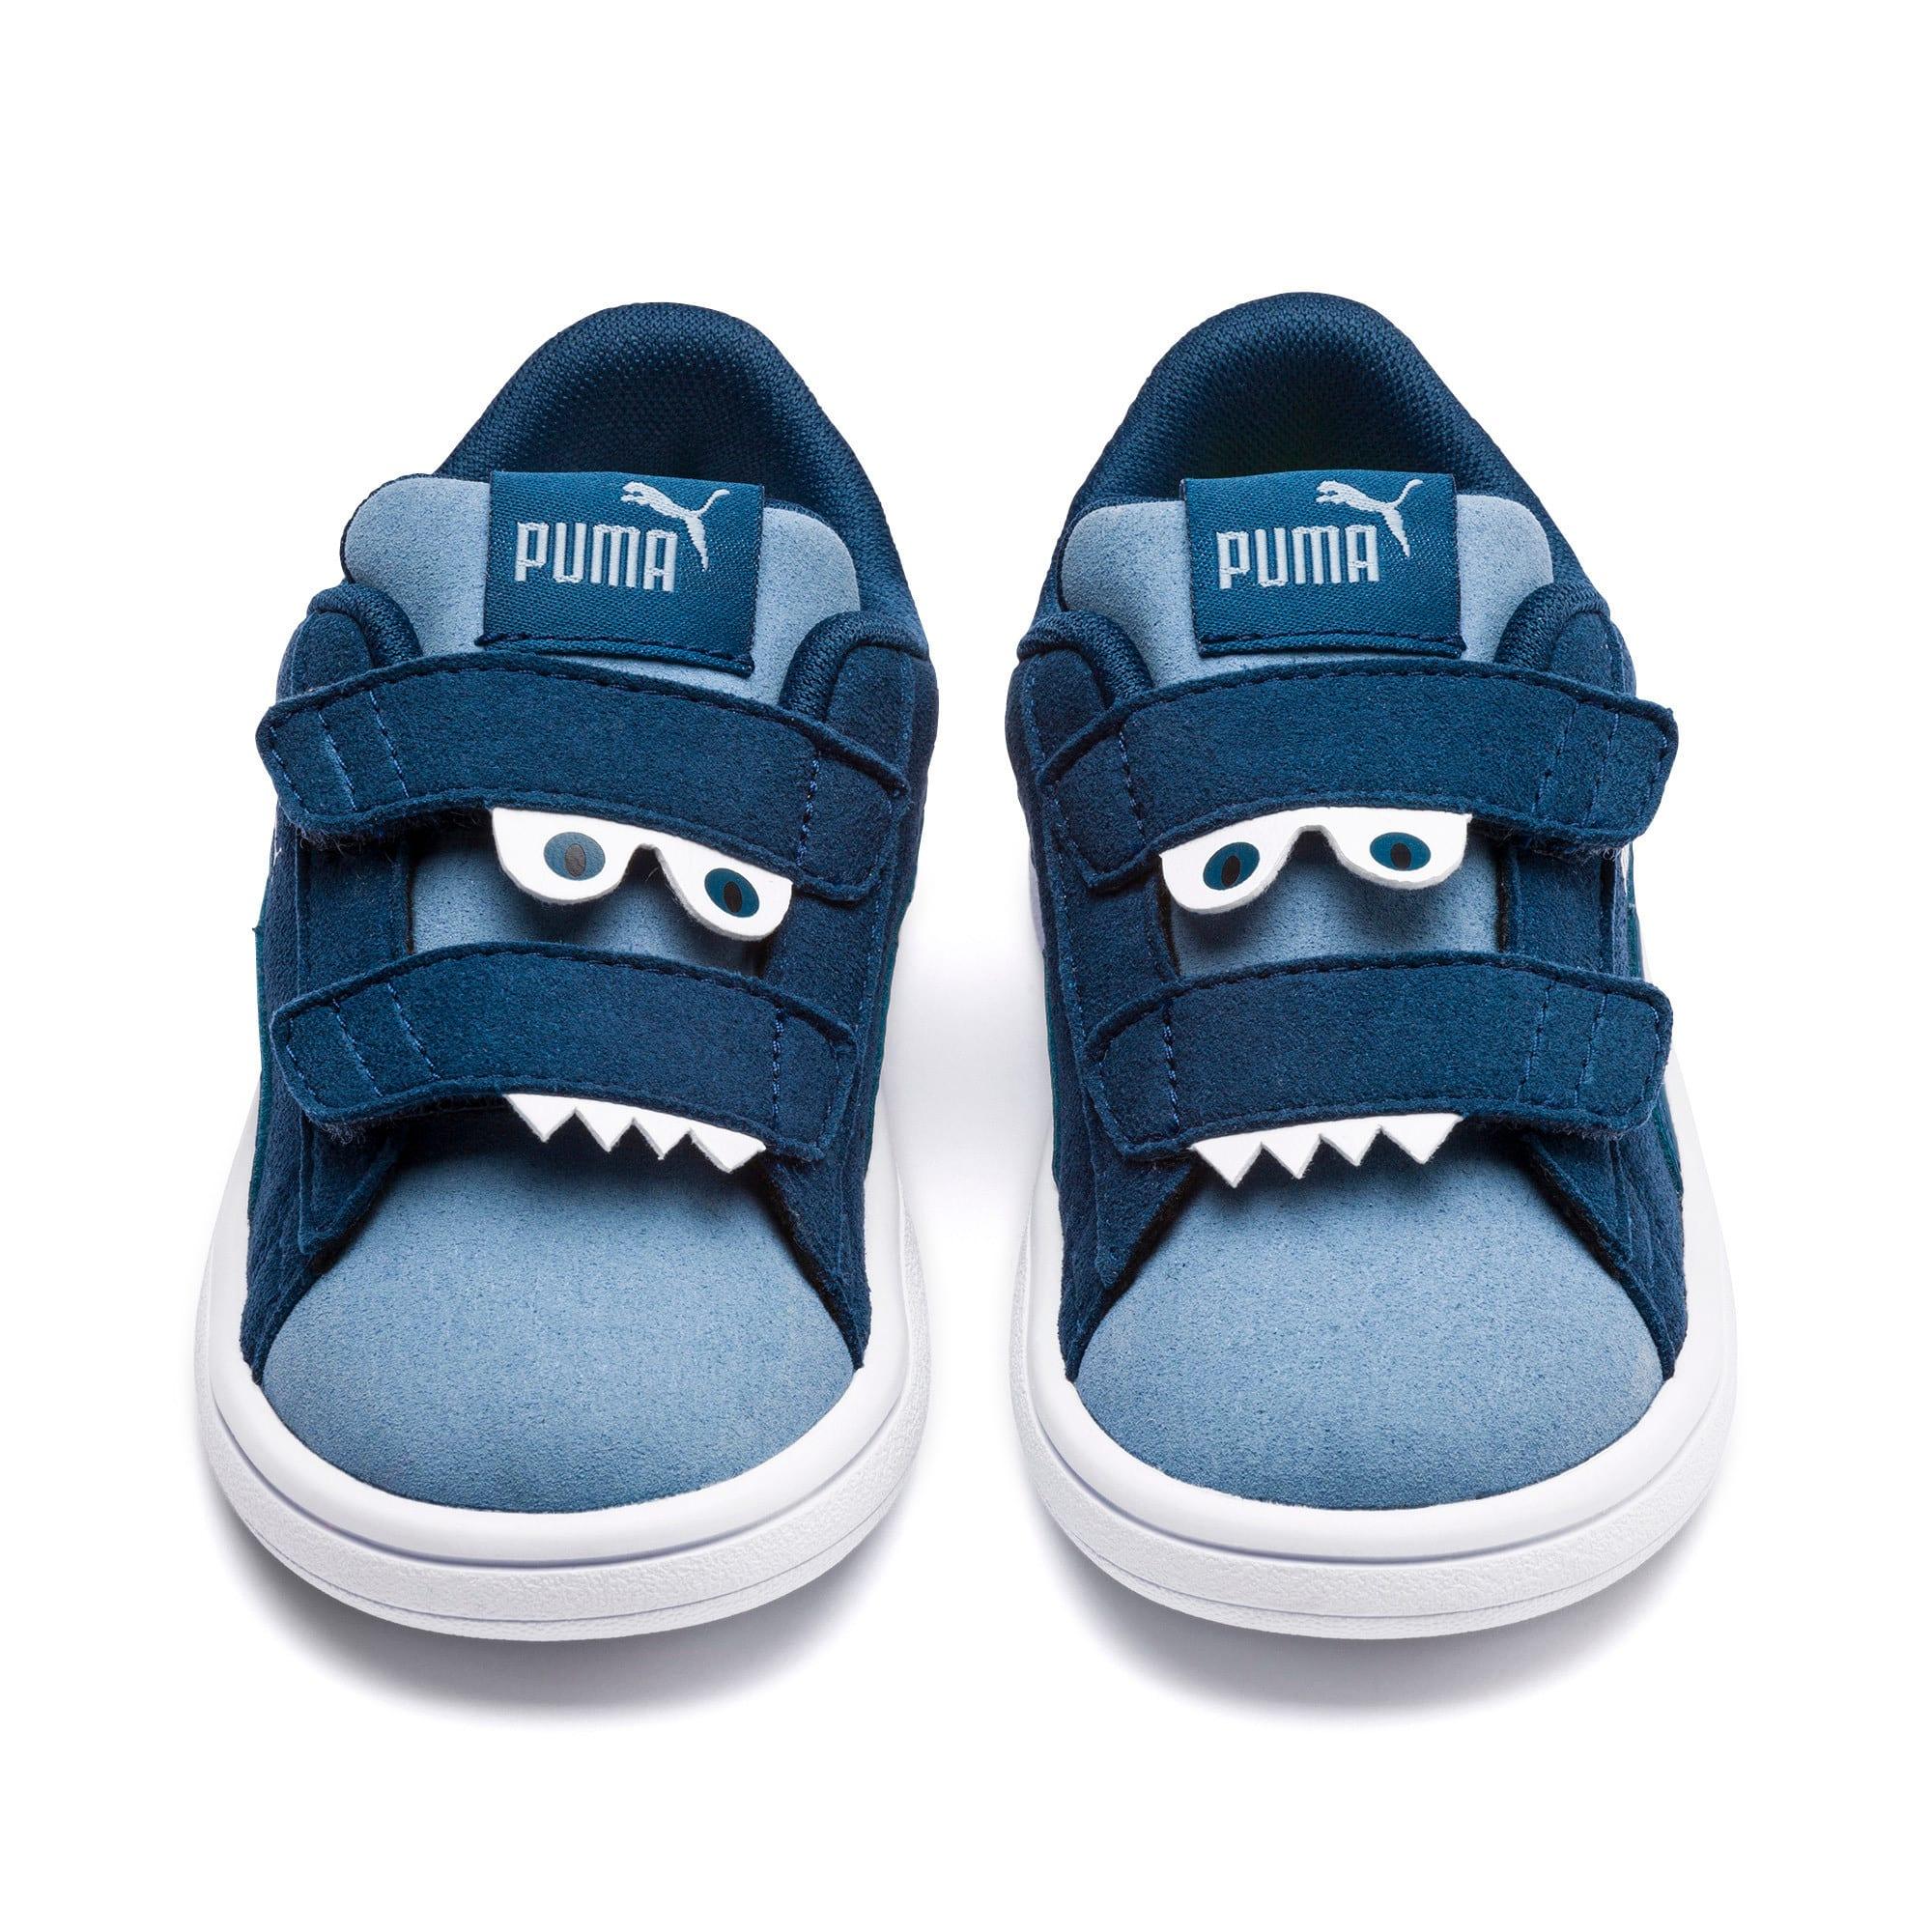 Thumbnail 6 of PUMA Smash v2 Monster Toddler Shoes, Gibraltar Sea-Faded Denim, medium